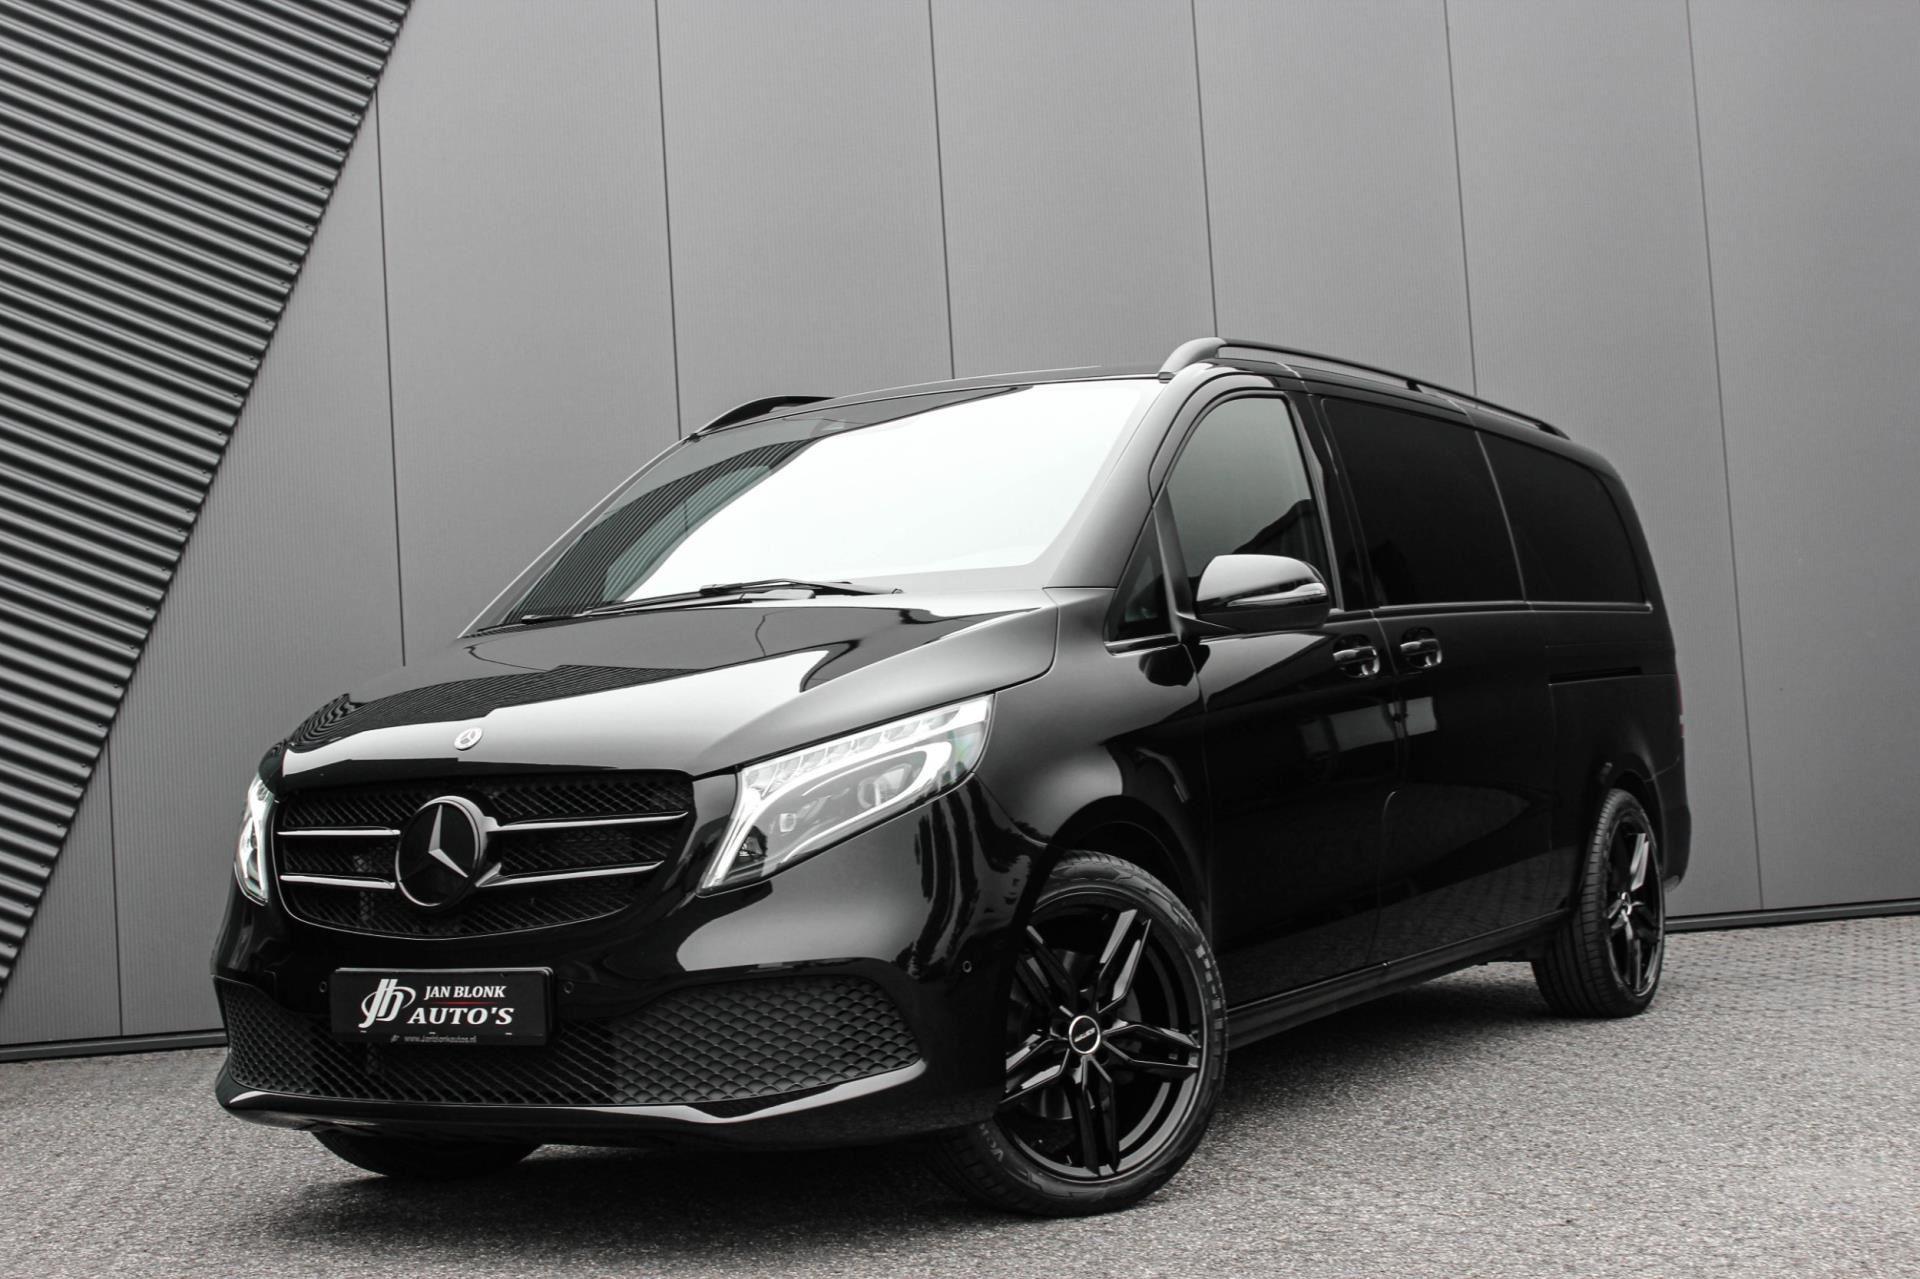 Mercedes-Benz V-klasse occasion - Jan Blonk Auto's